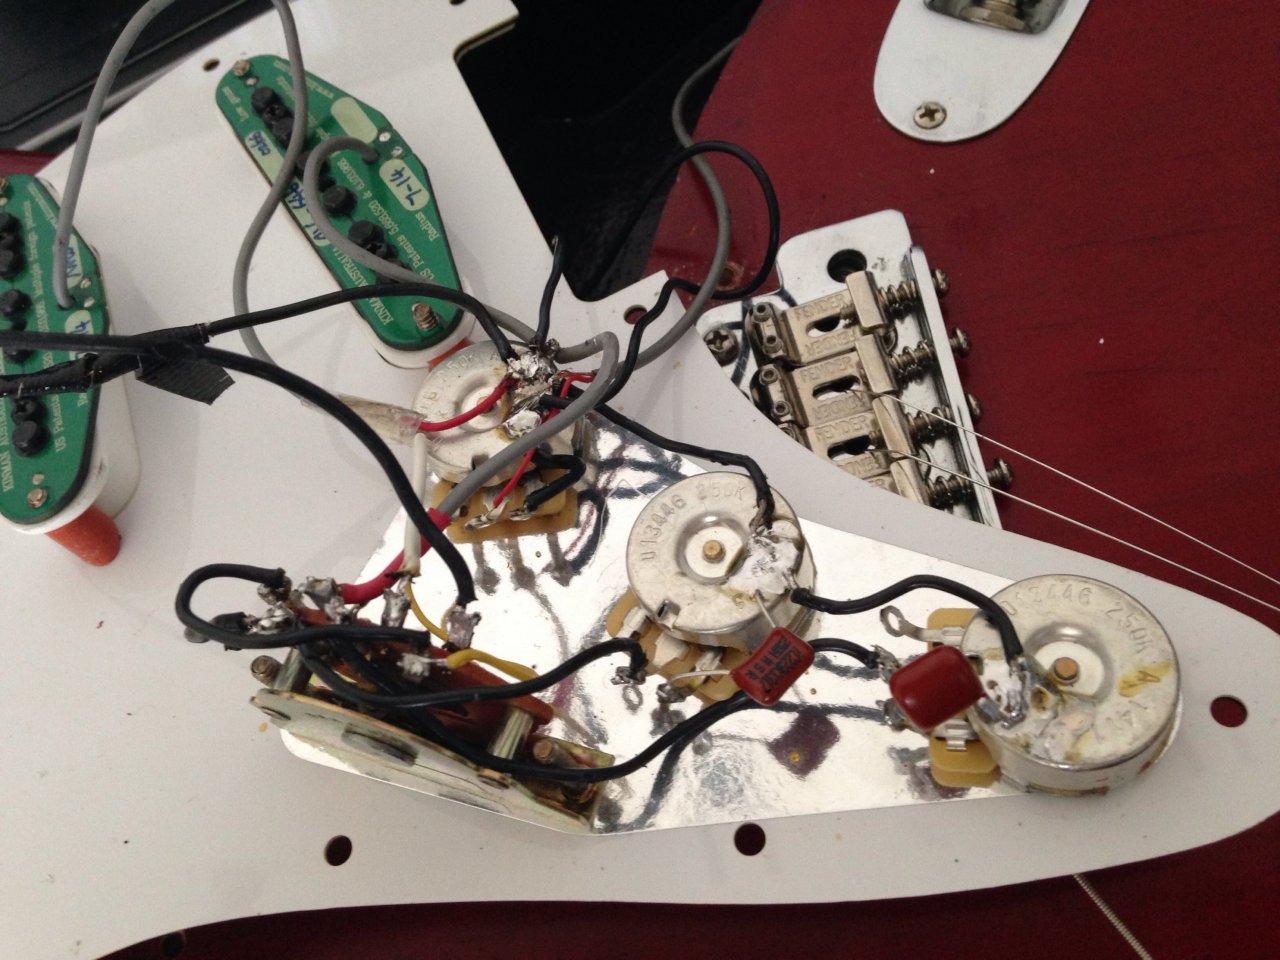 Fender Stratocaster Pickups falsch gelötet?? | Musiker-Board